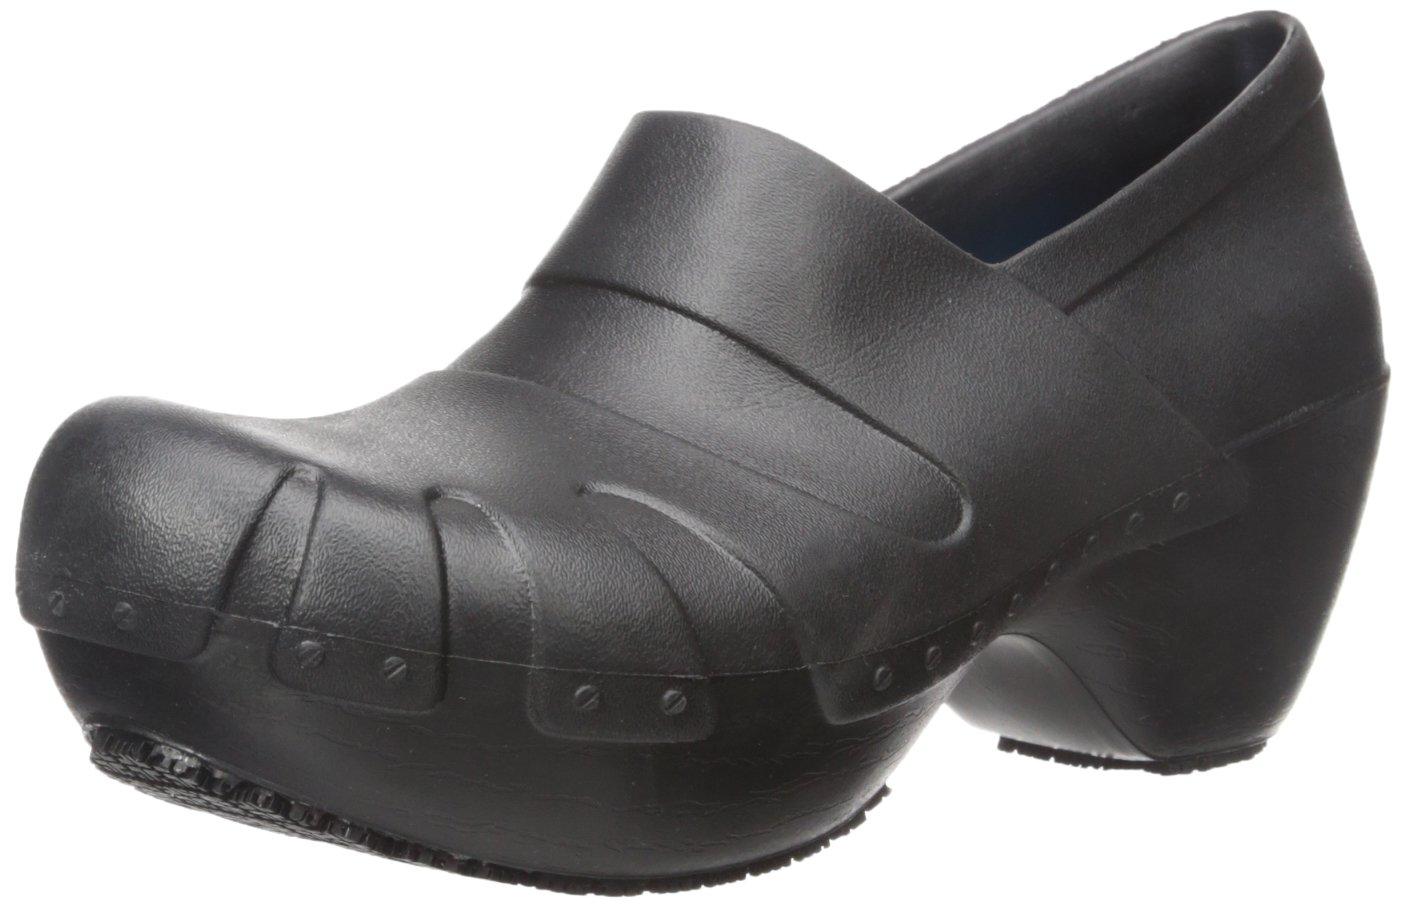 Dr. Scholl's Women's Trance Slip Resistant Clog, Black, 11 M US